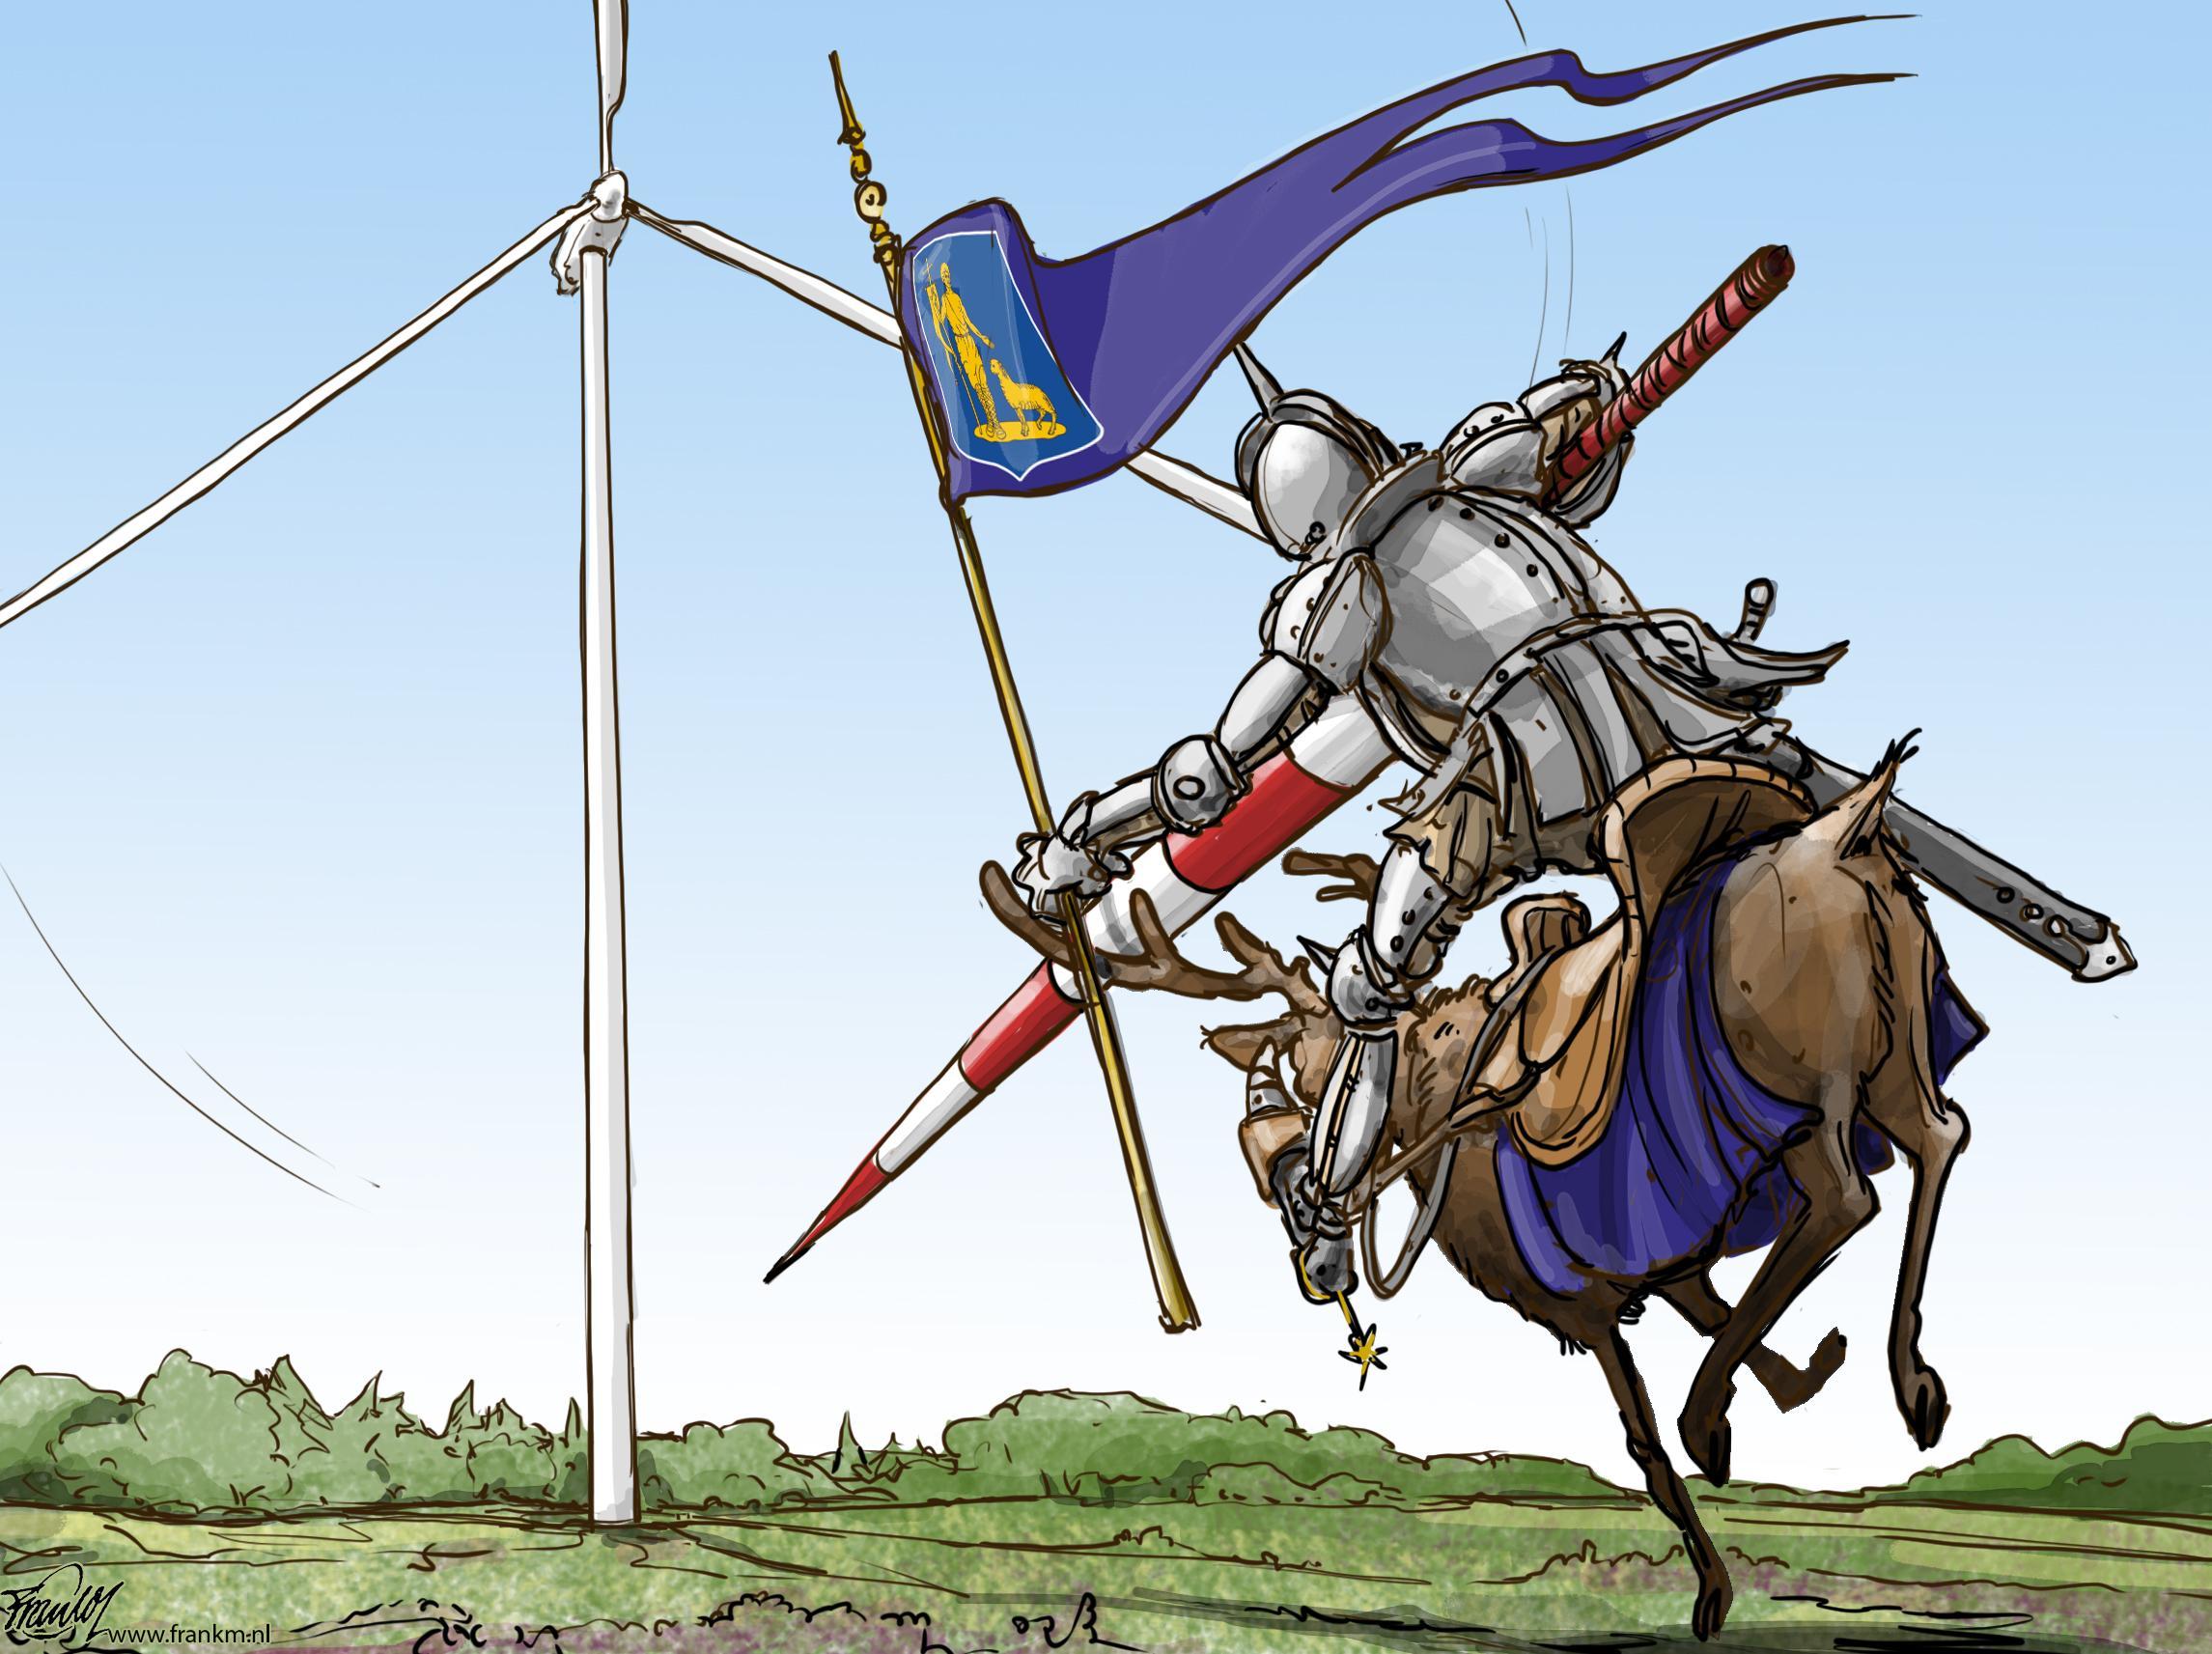 Lage Vuursche wil vechten tegen windmolens | cartoon Muntjewerf